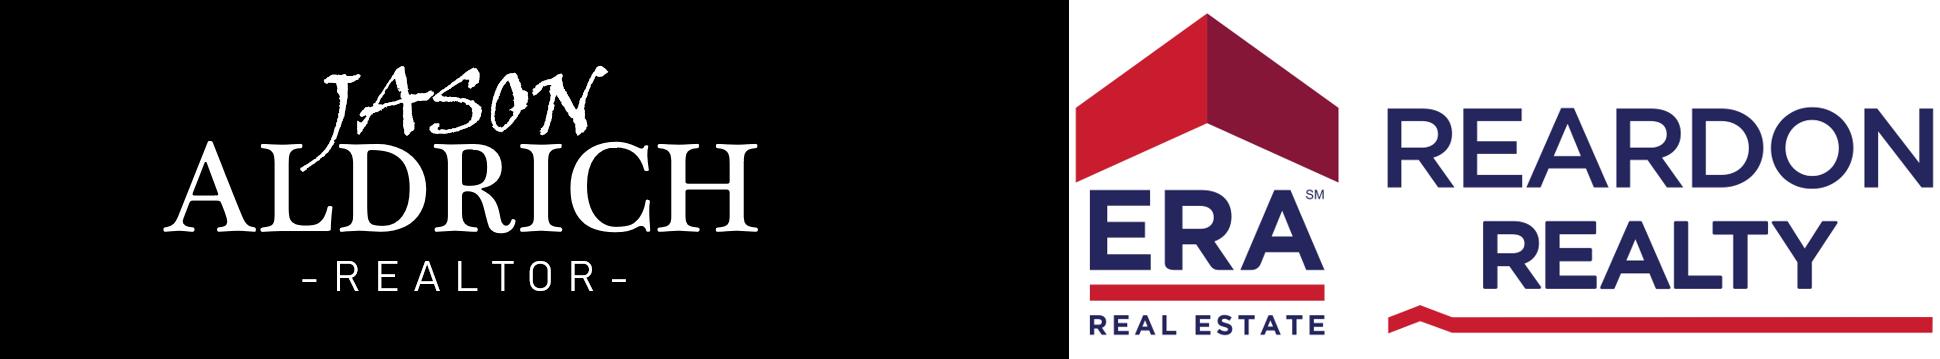 Era real estate logo clipart vector royalty free All Agents | ERA Reardon Realty - Michigan\'s #1 ERA Real Estate ... vector royalty free